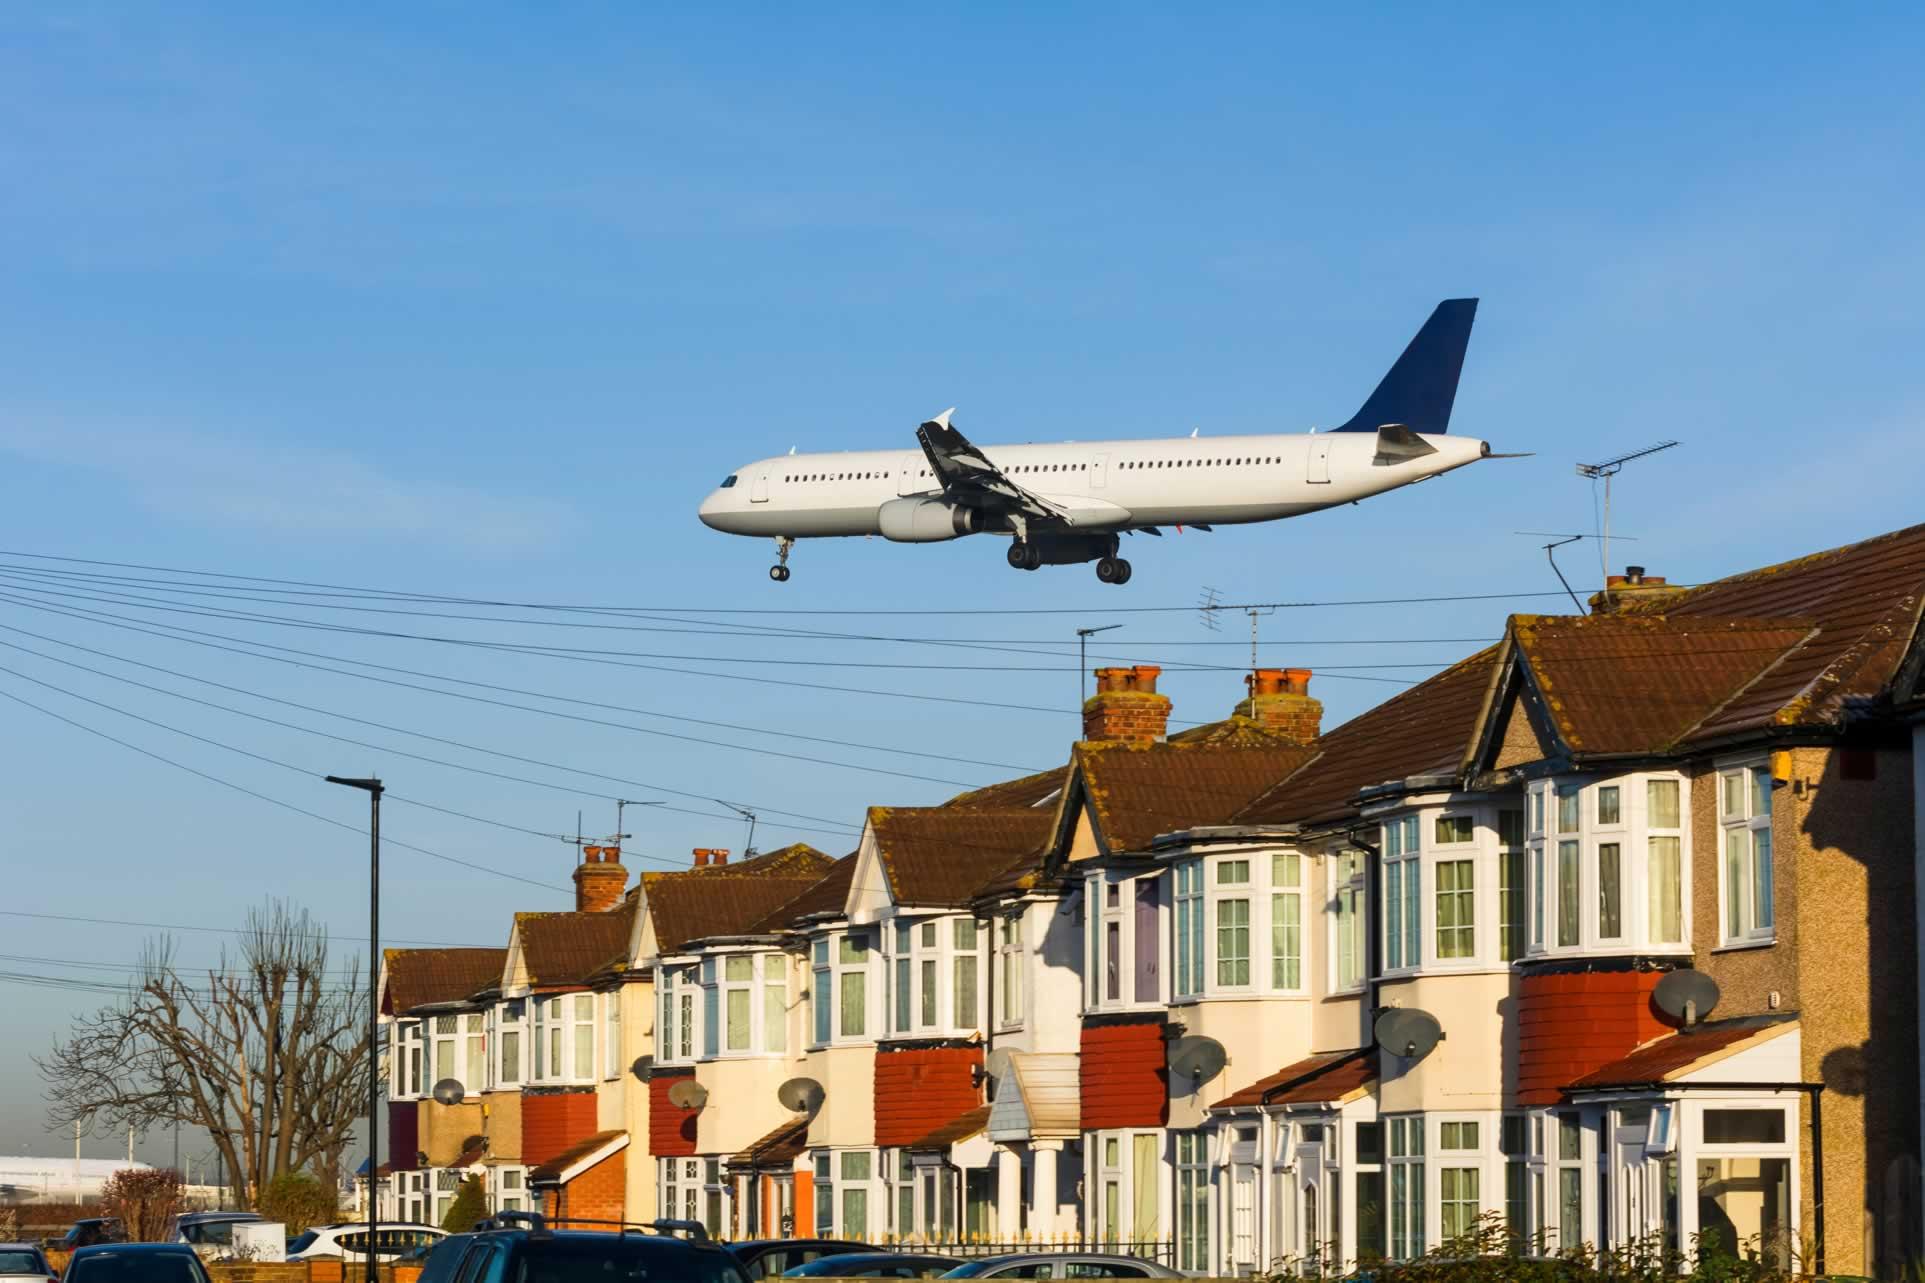 Low-flying plane